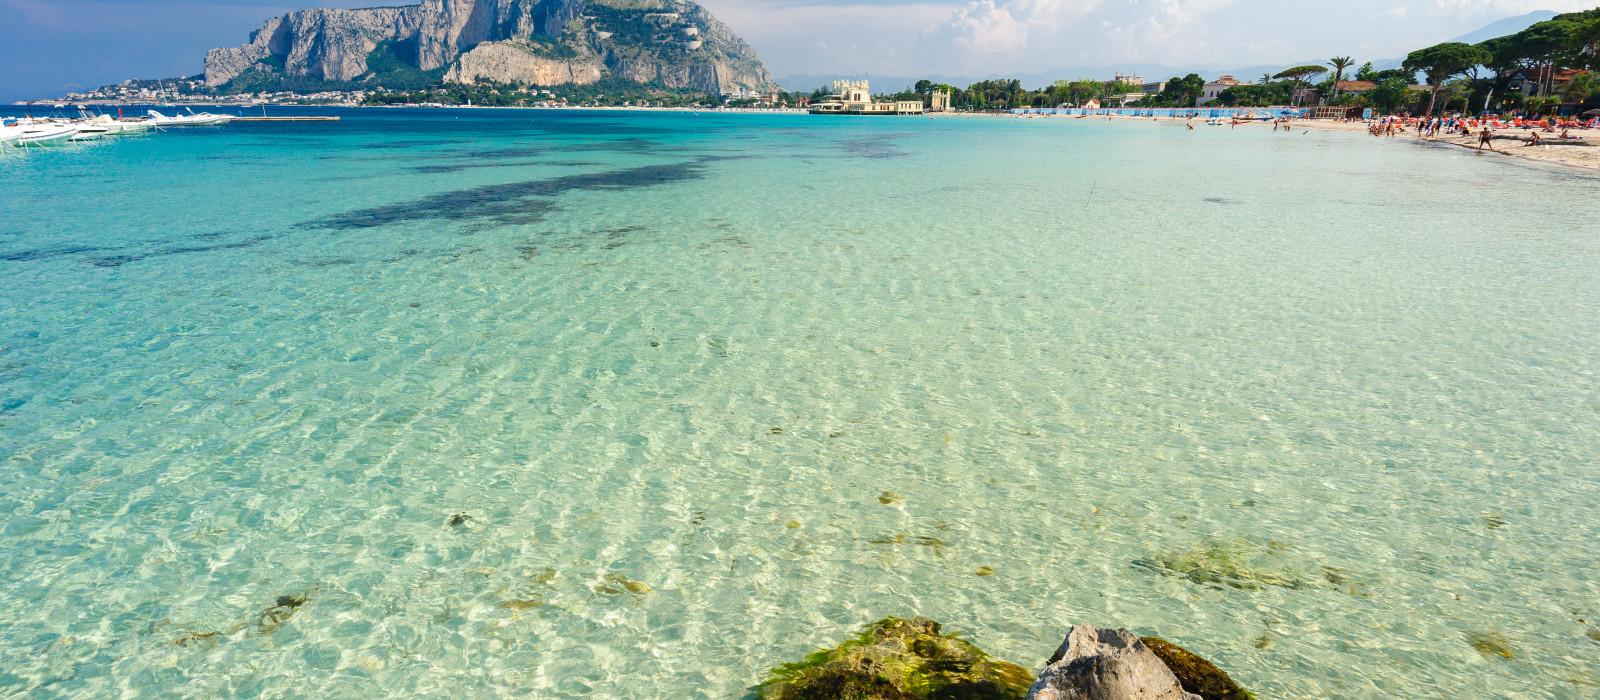 Destination Palermo Italy